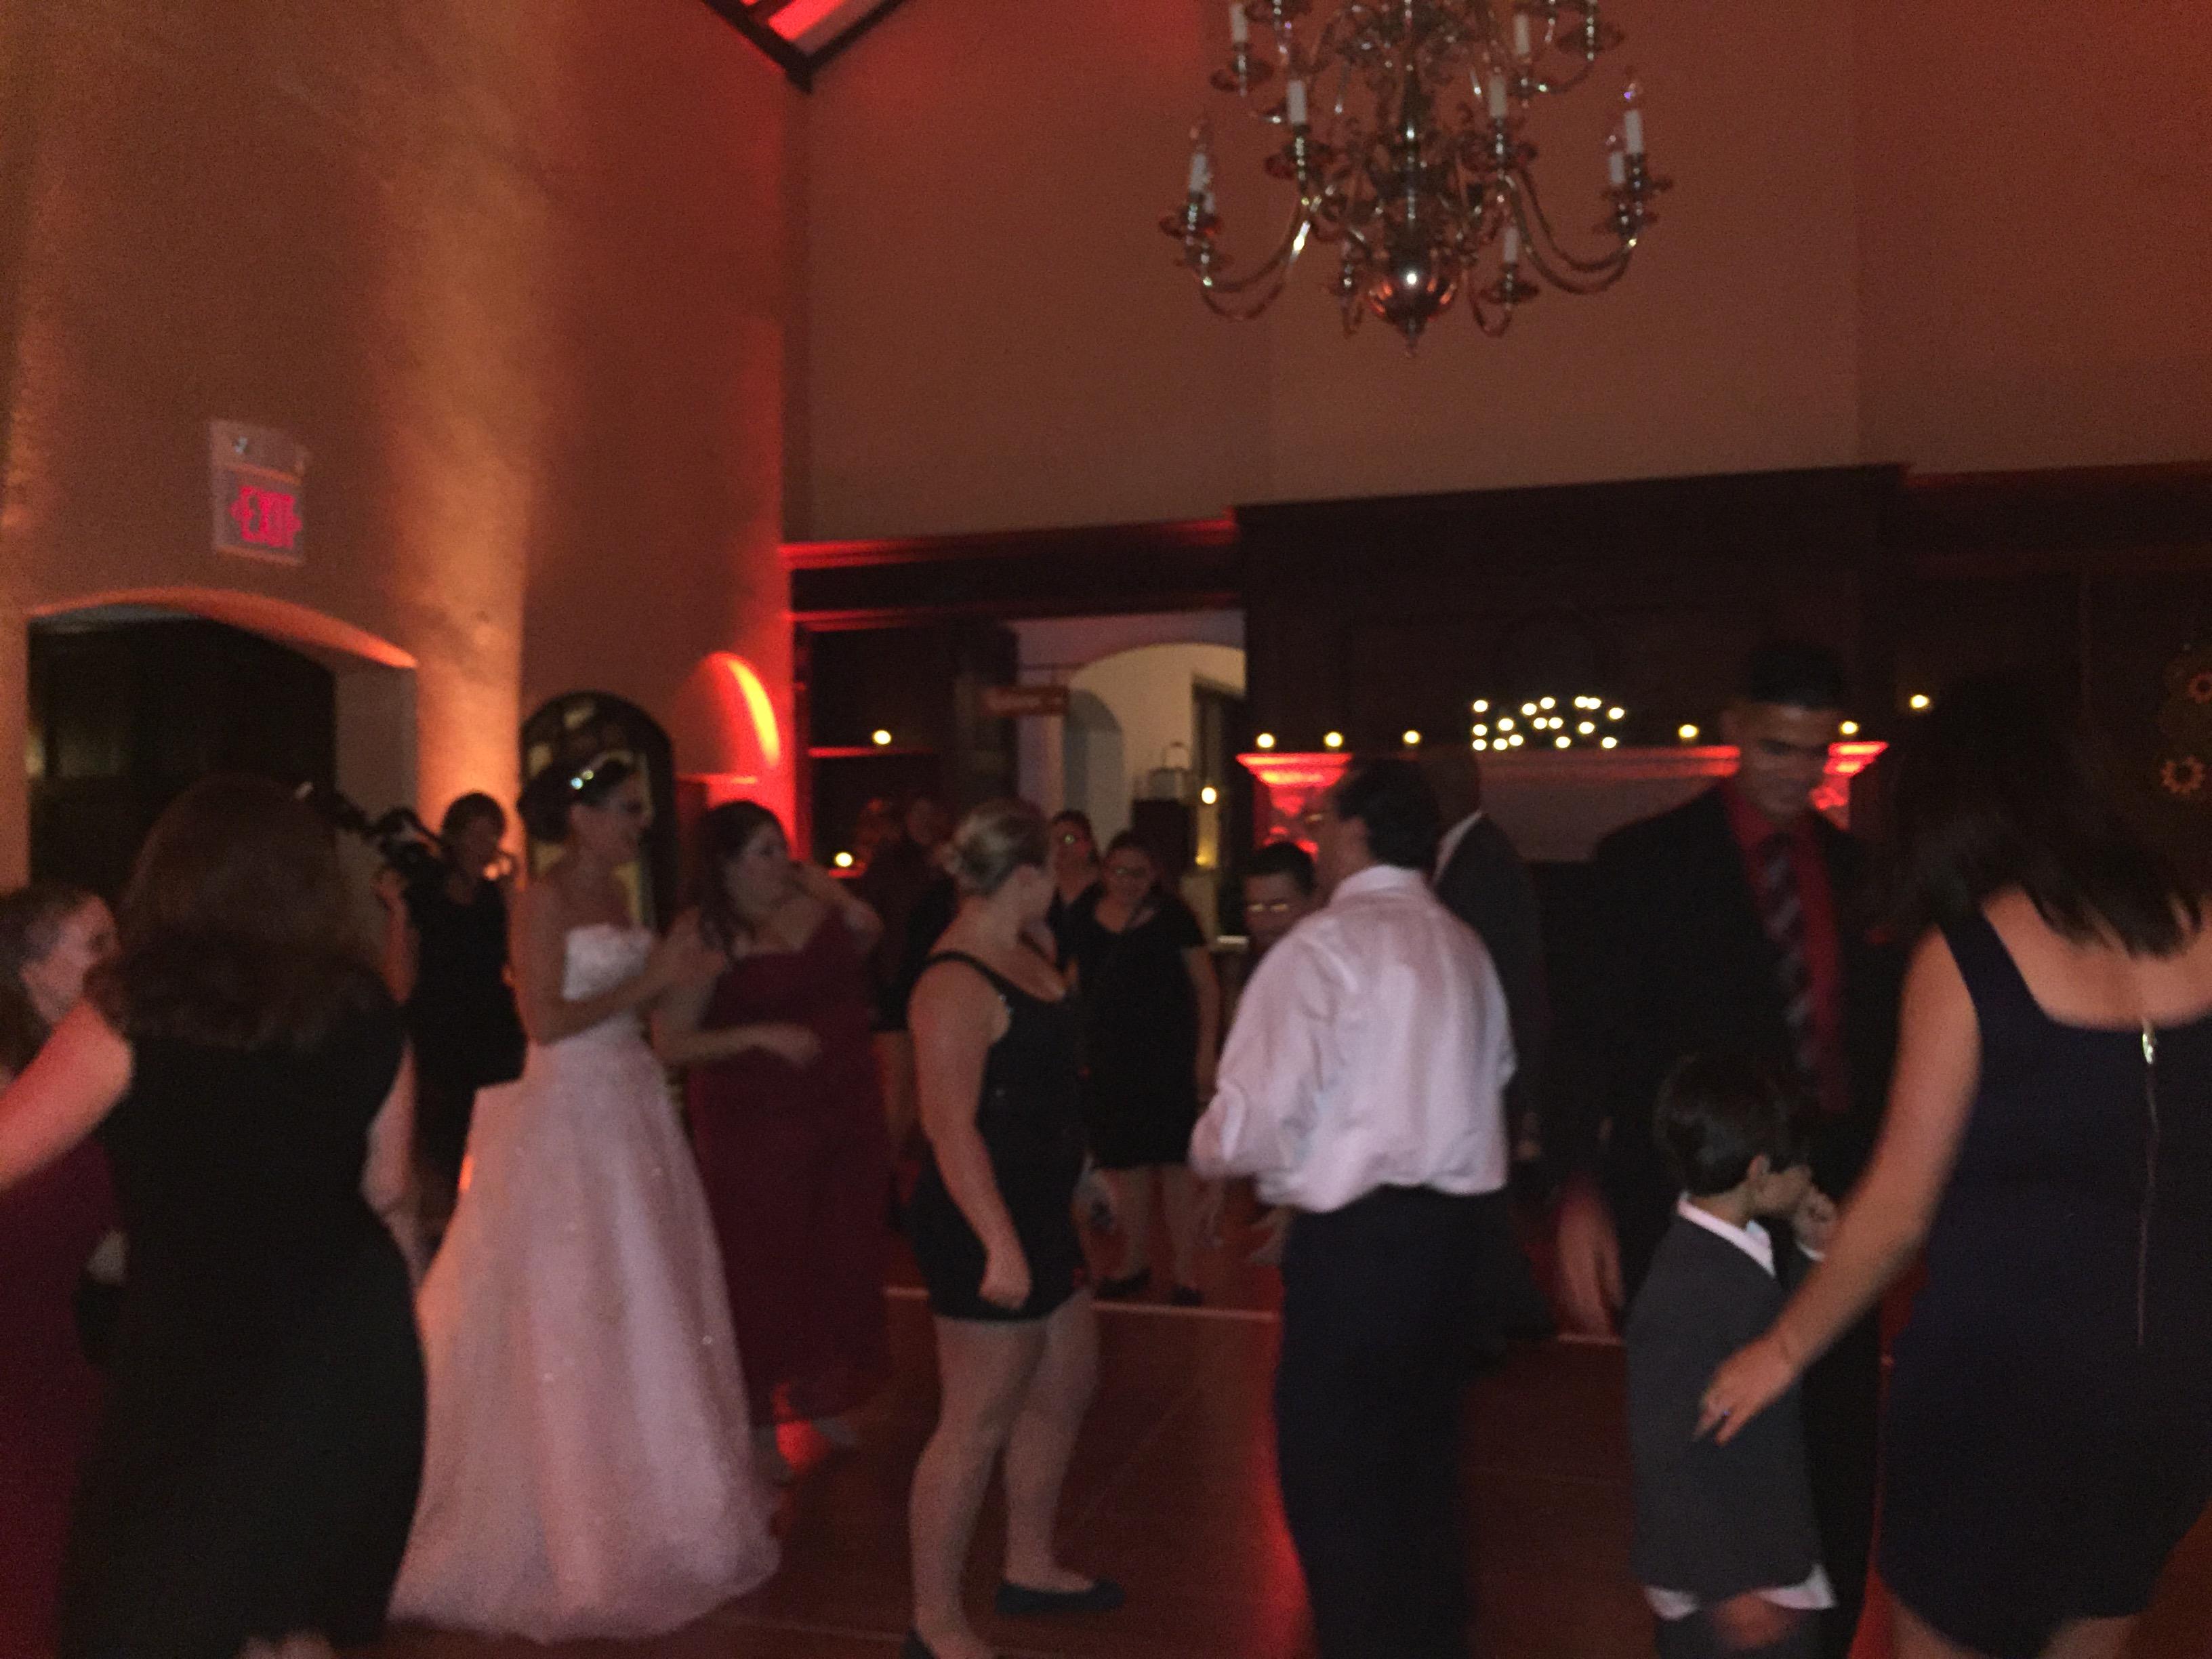 holyoke wedding dj, boston wedding dj, wedding dj ma, dj chris sawyer, mill one open square wedding, danvers ma wedding dj, ma wedding, danvers dj, danvers weddings